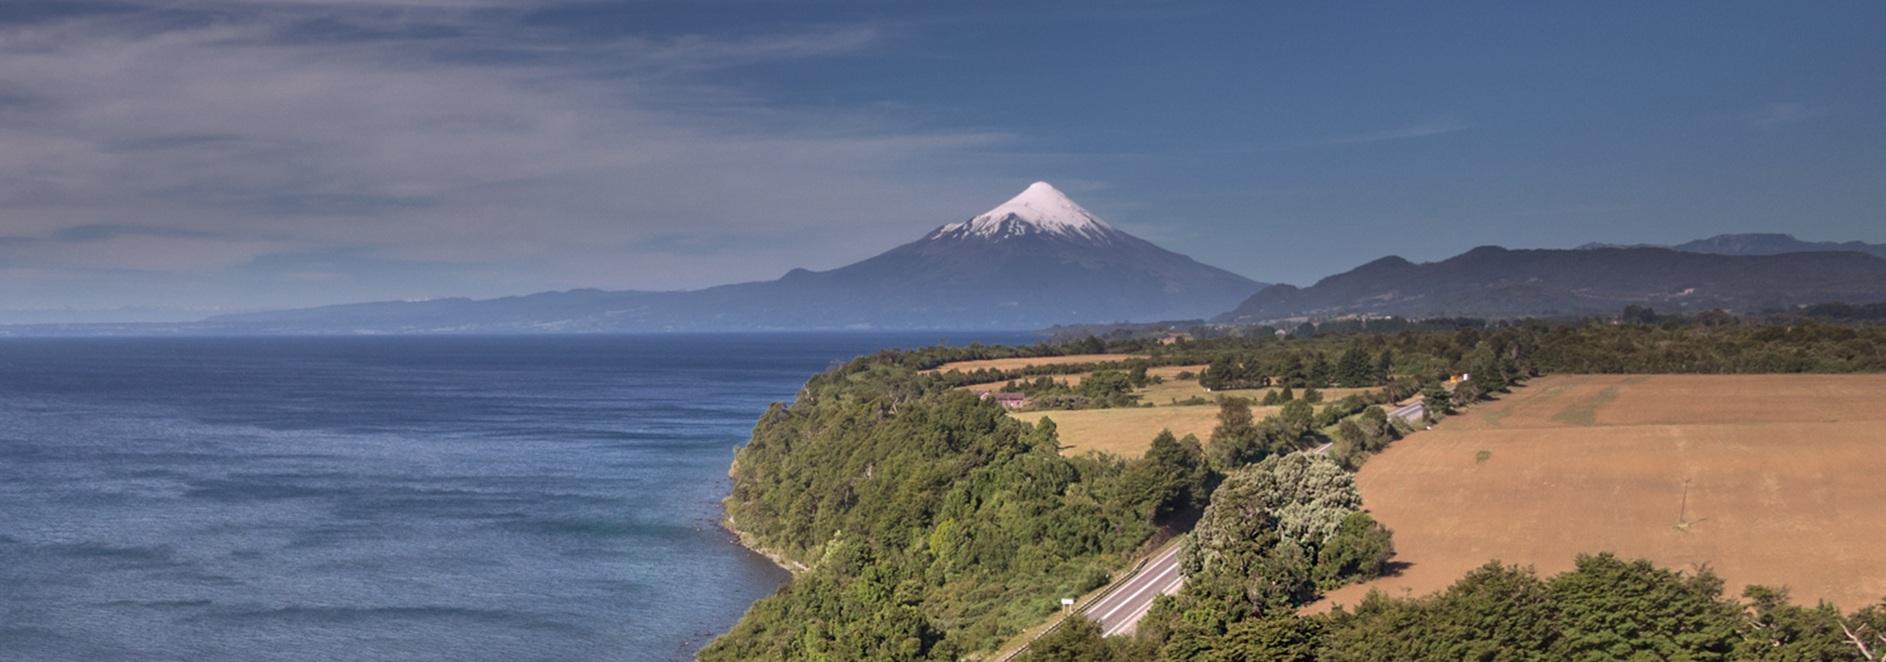 Osorno Volcano towering over Lake Llanquihue